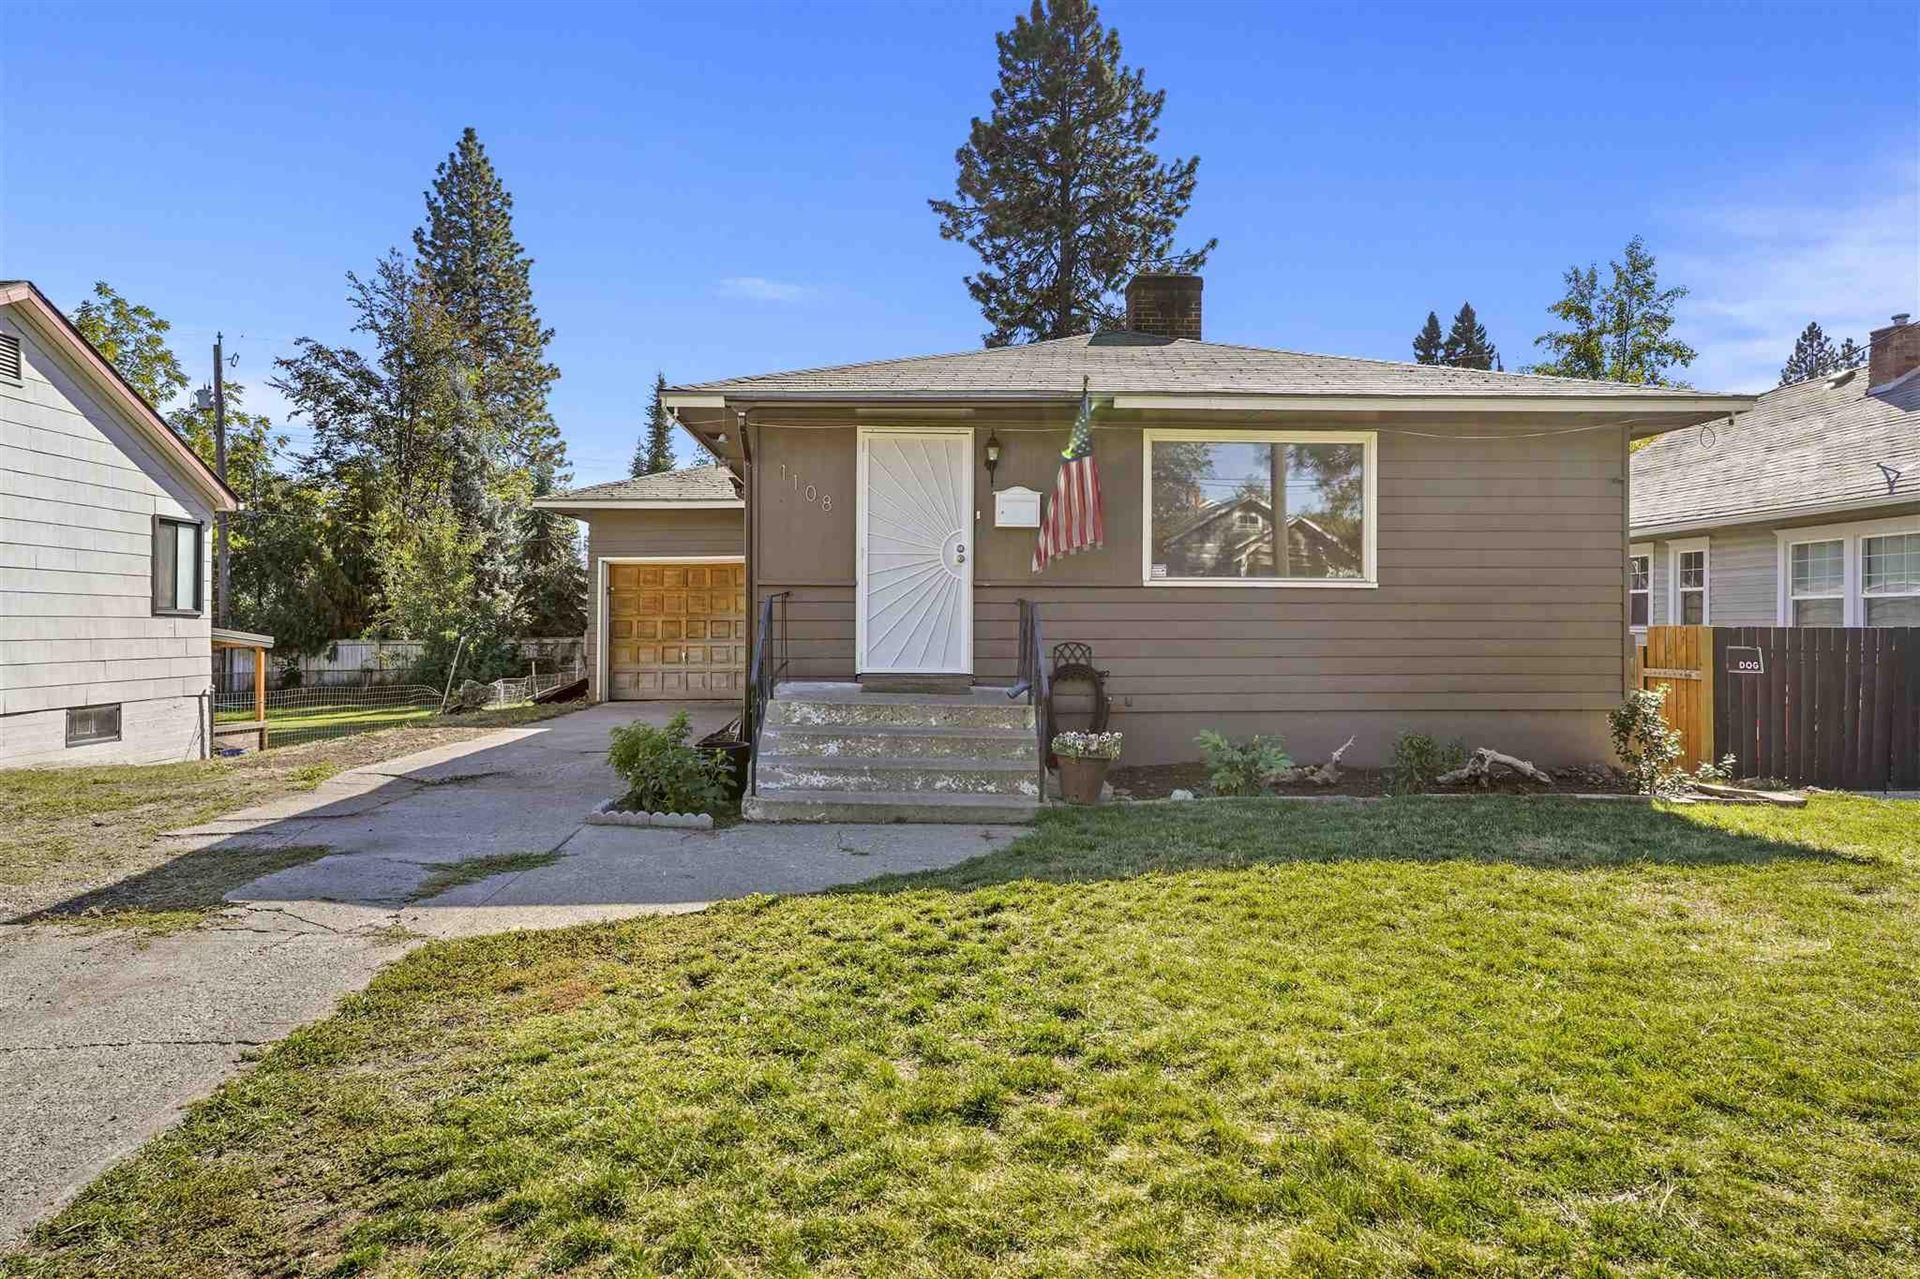 1108 E 32nd Ave, Spokane, WA 99203 - #: 202122001